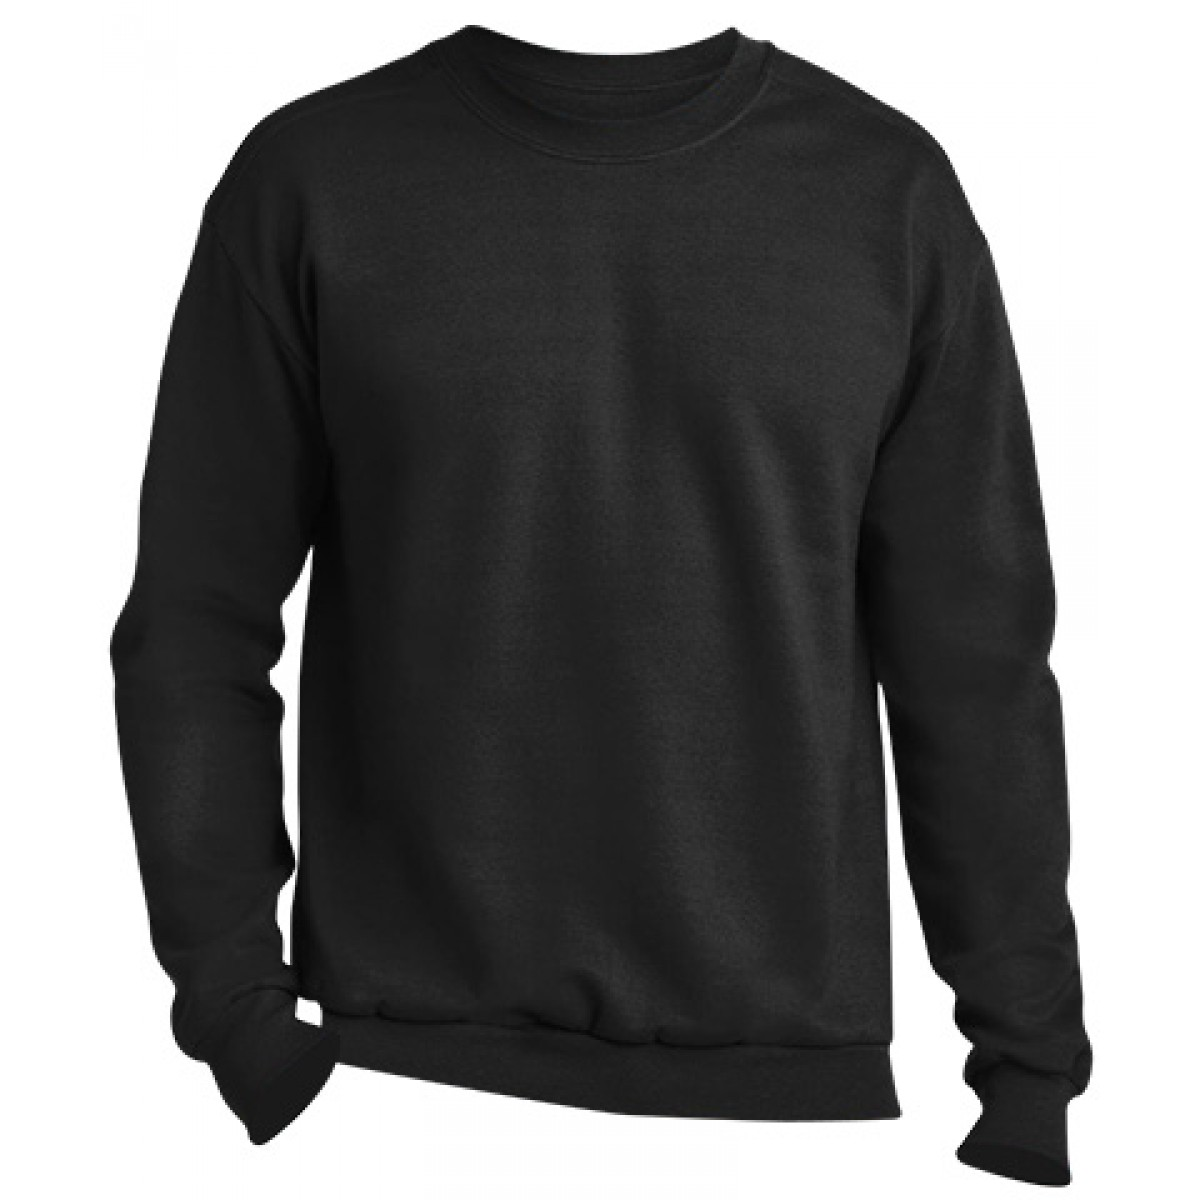 Crewneck Sweater -Black-XL